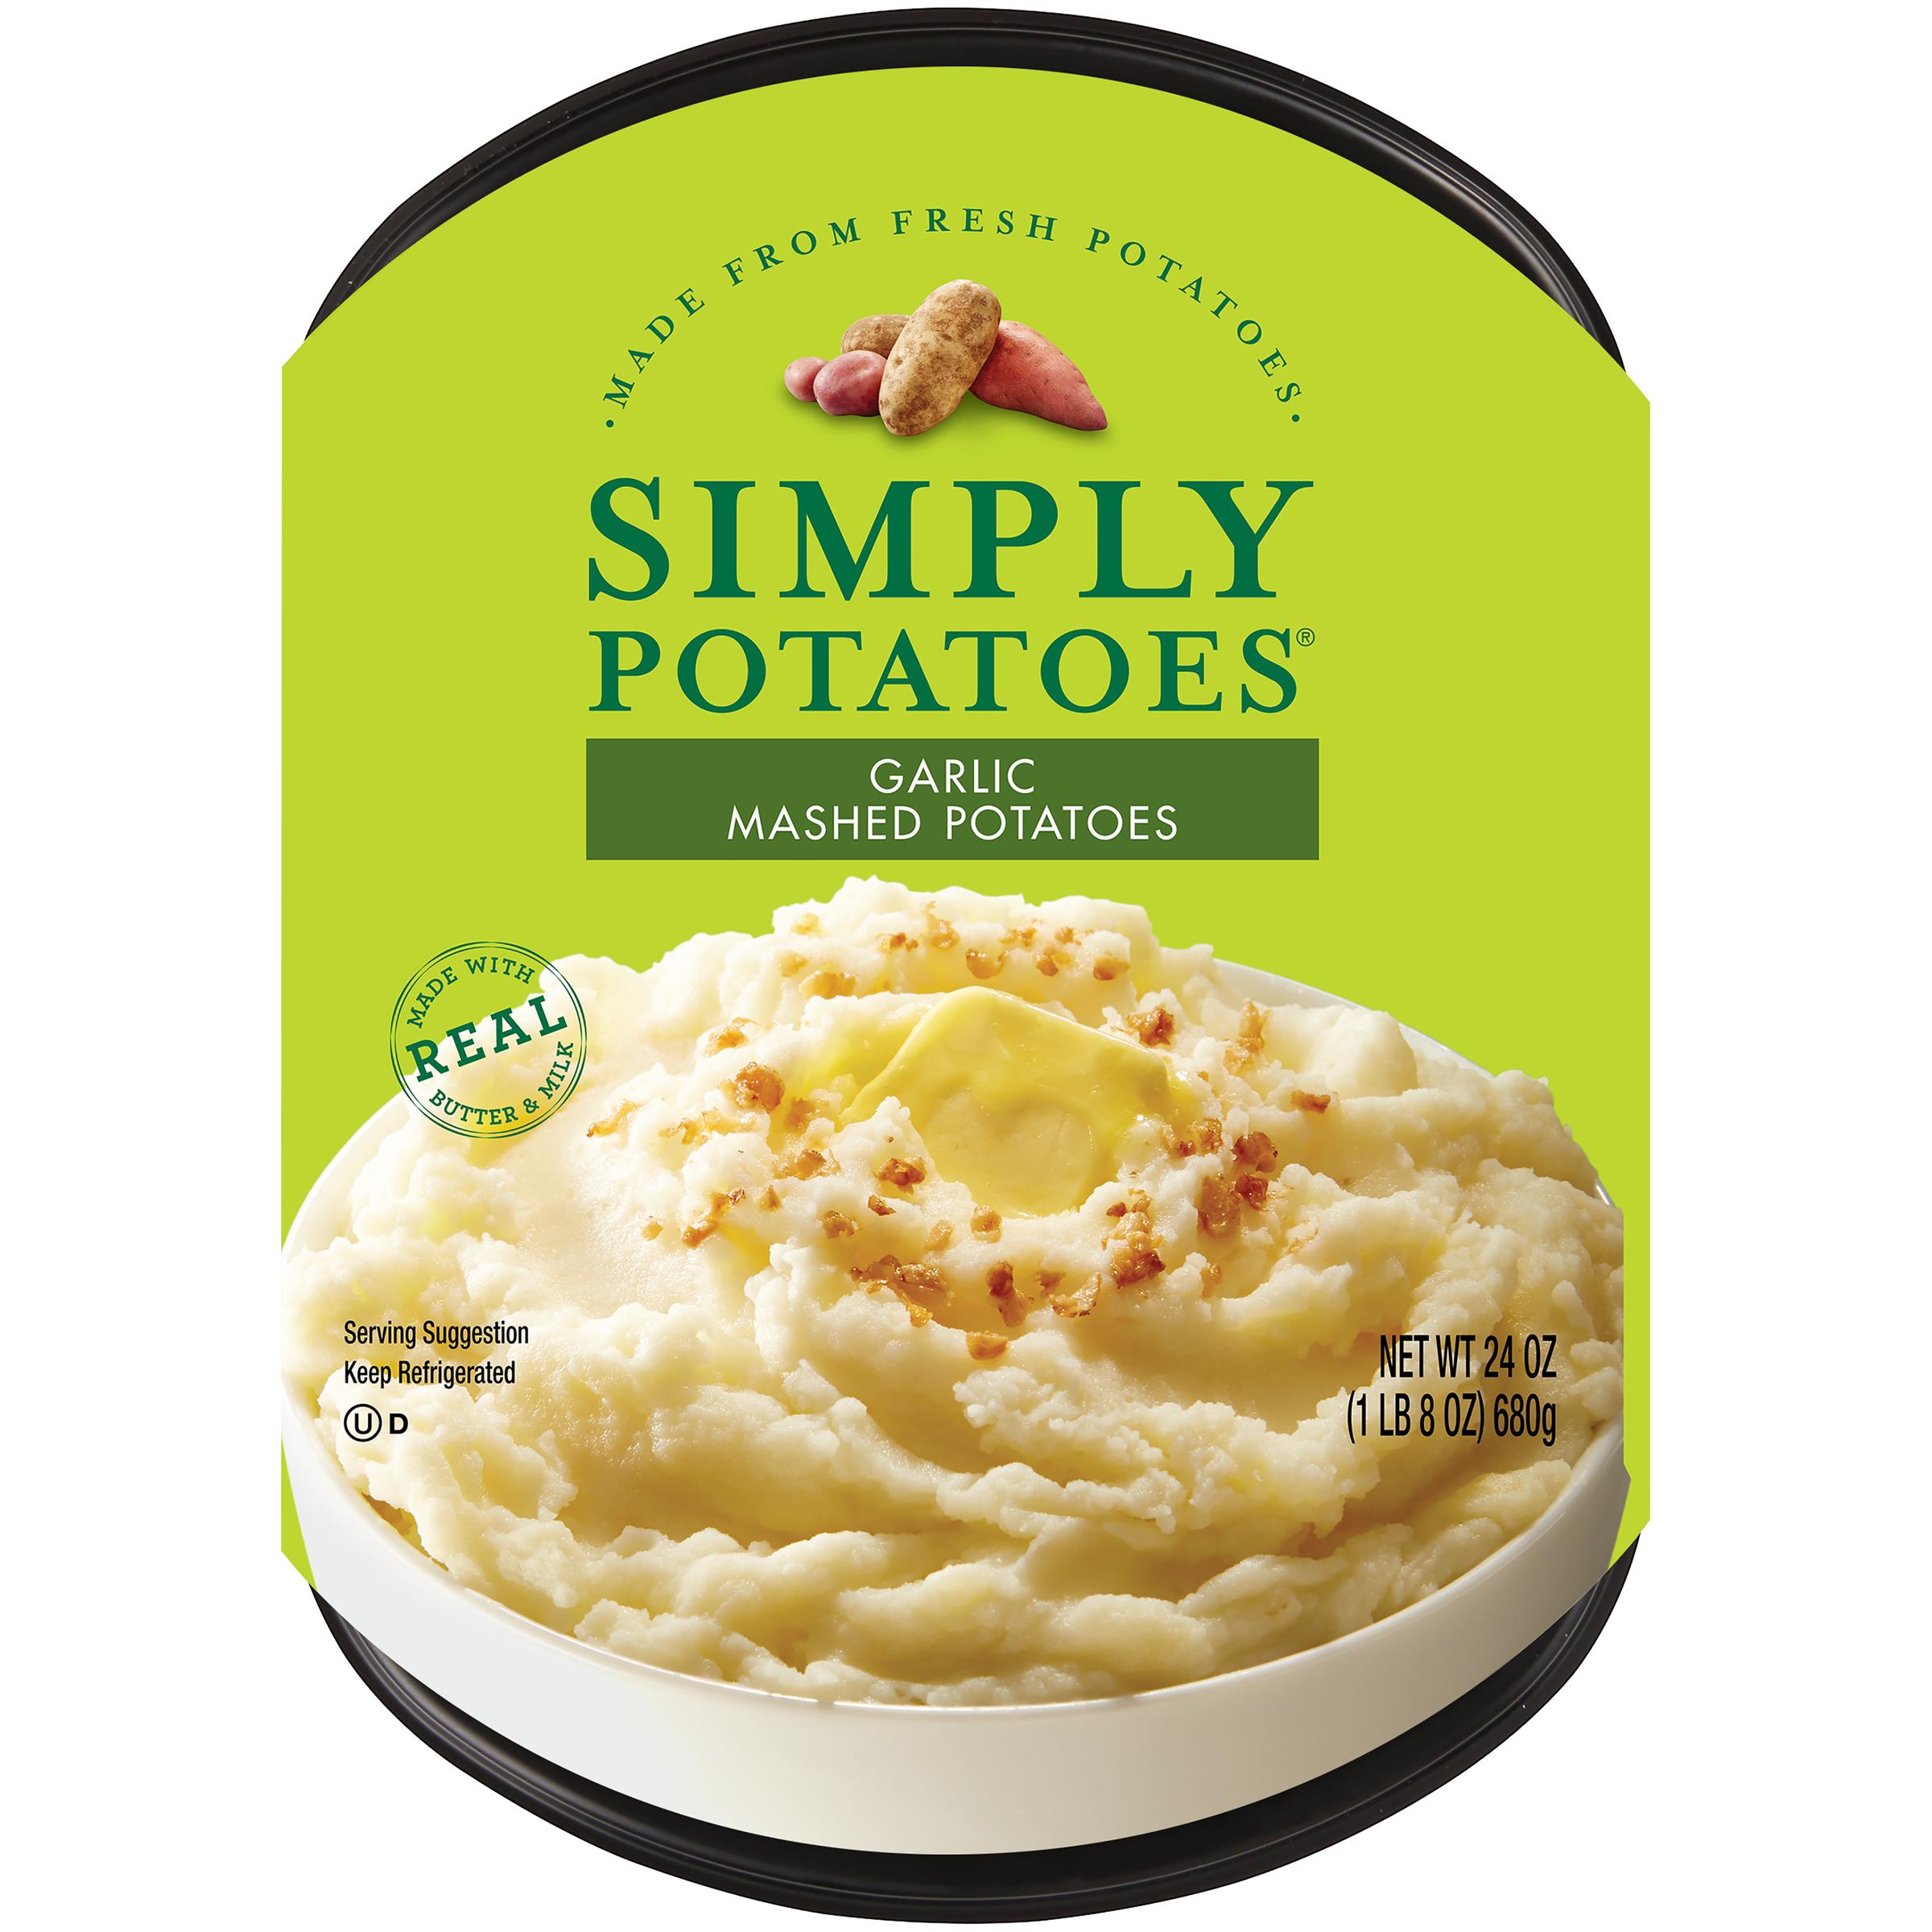 photo of Simply Potatoes Garlic Mashed Potatoes product